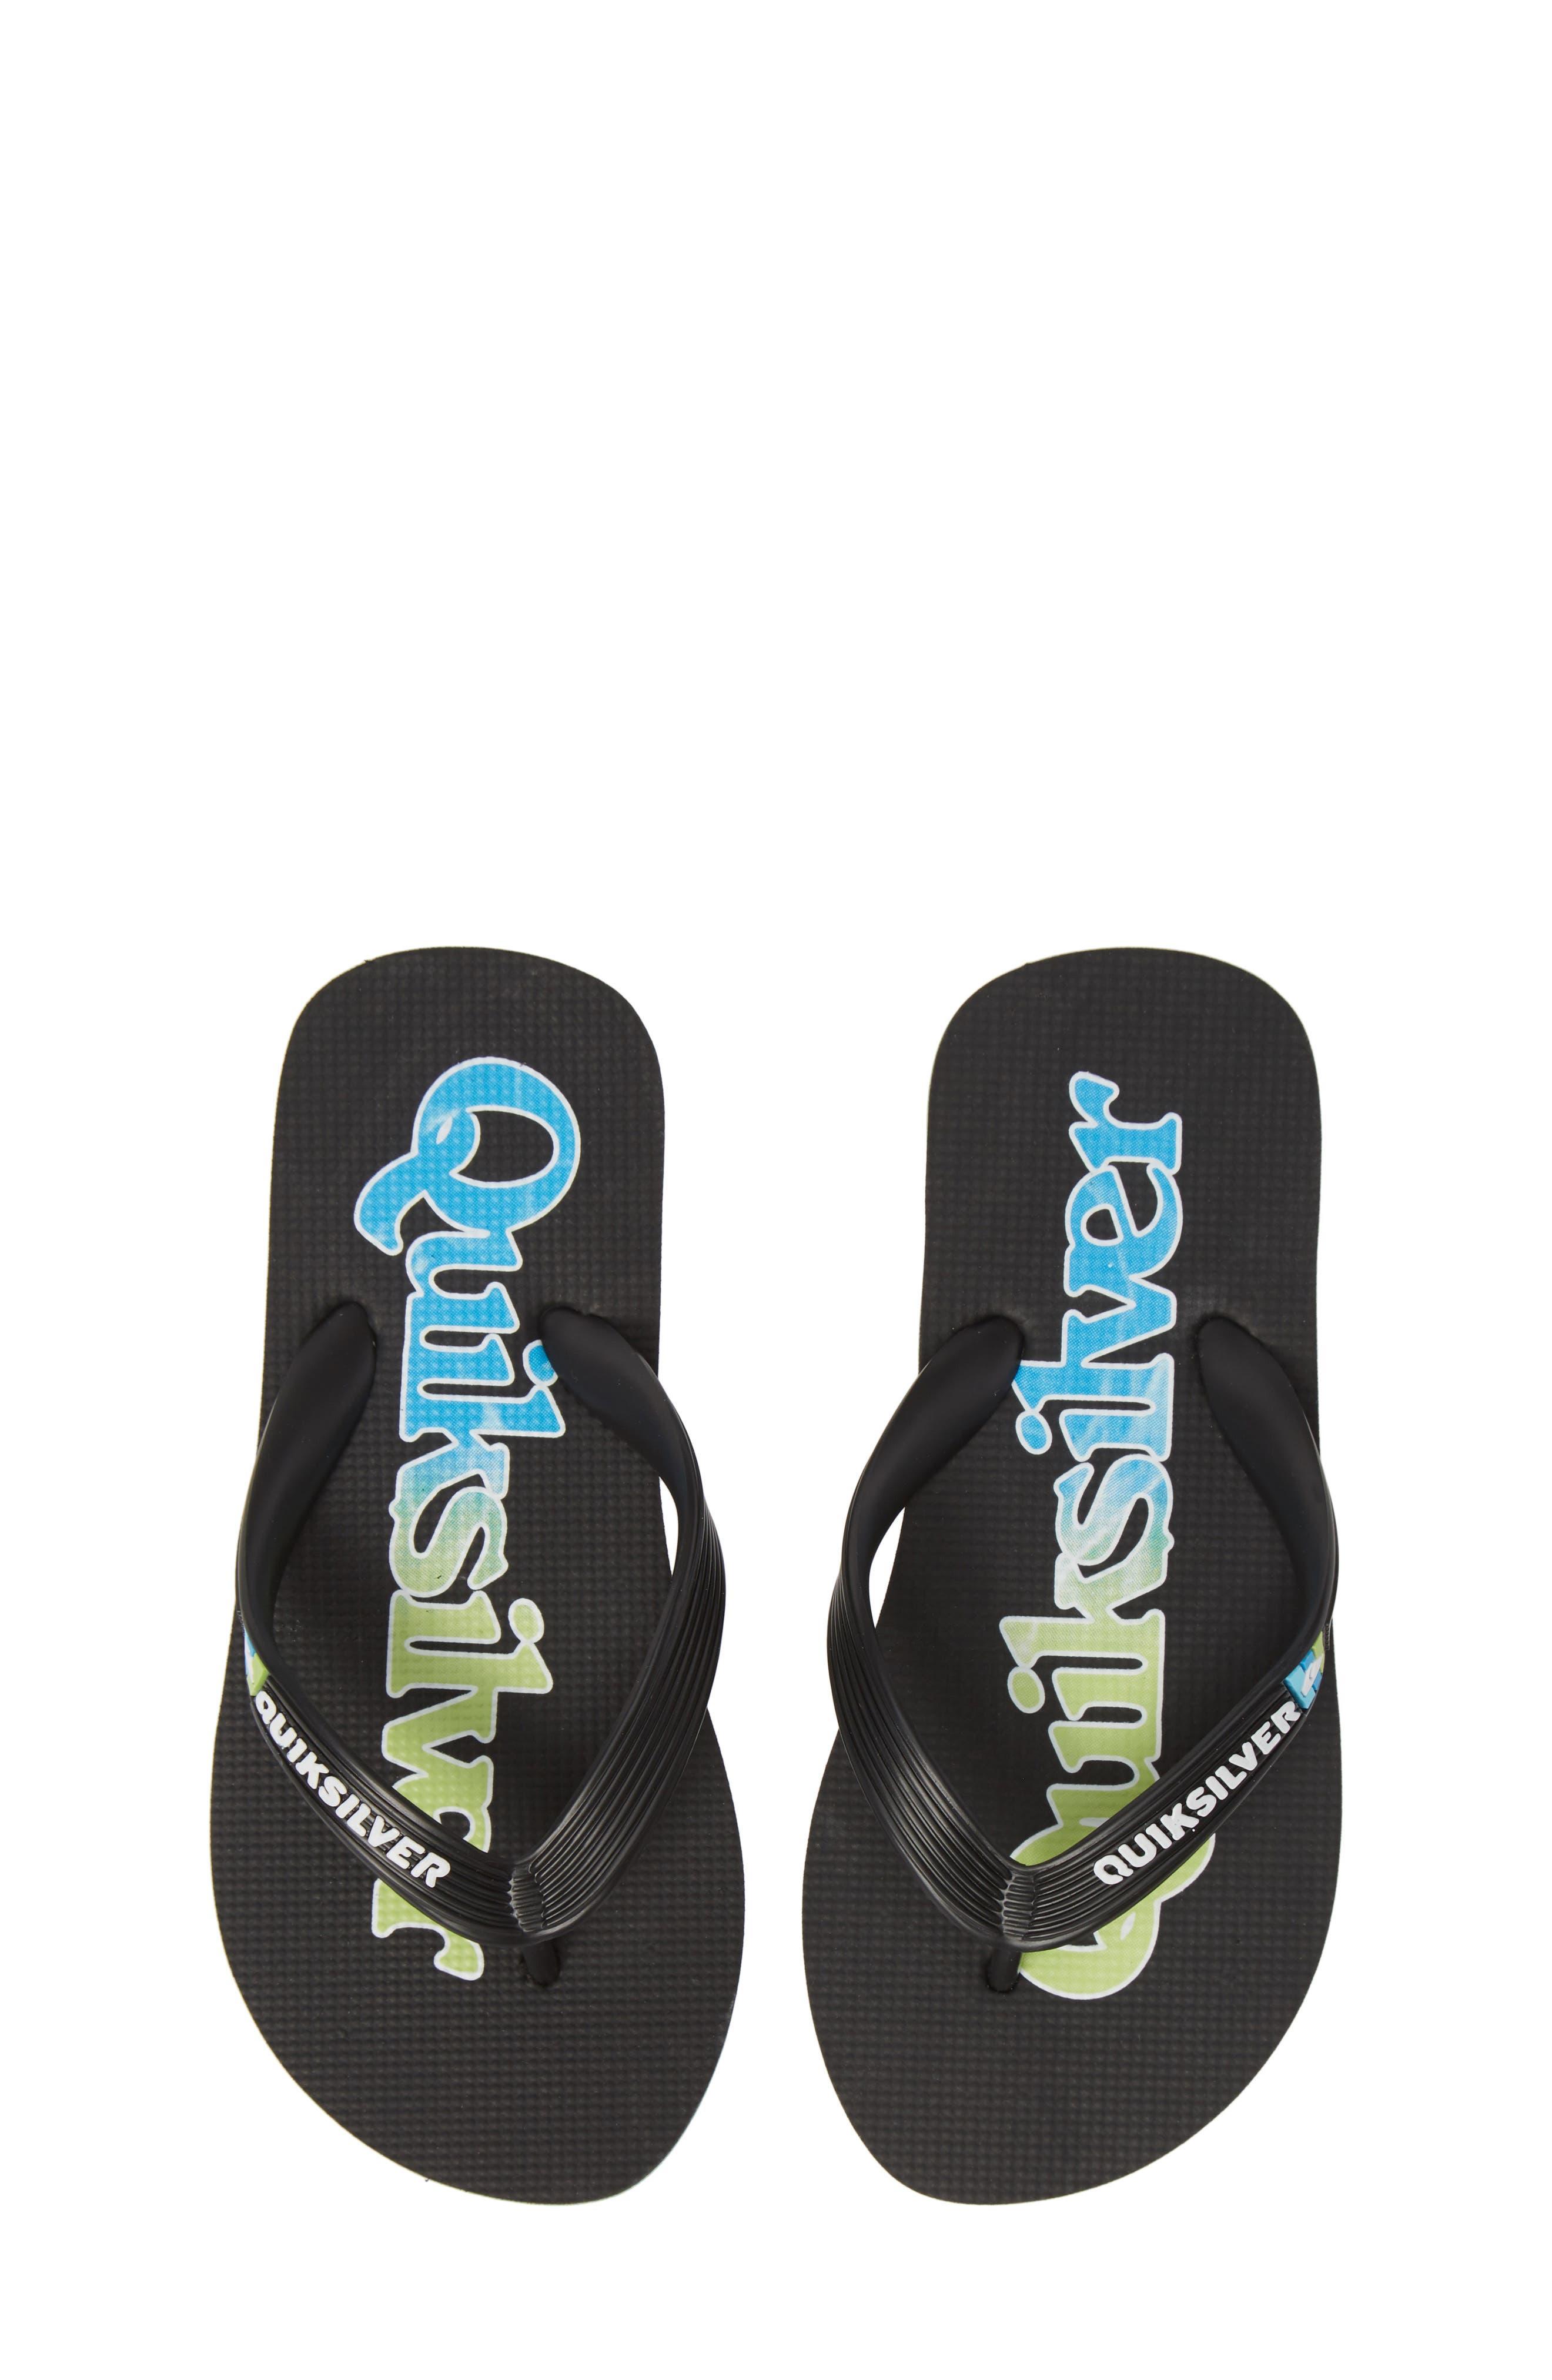 QUIKSILVER Molokai Wordmark Flip Flop, Main, color, BLACK/ GREEN/ BLUE